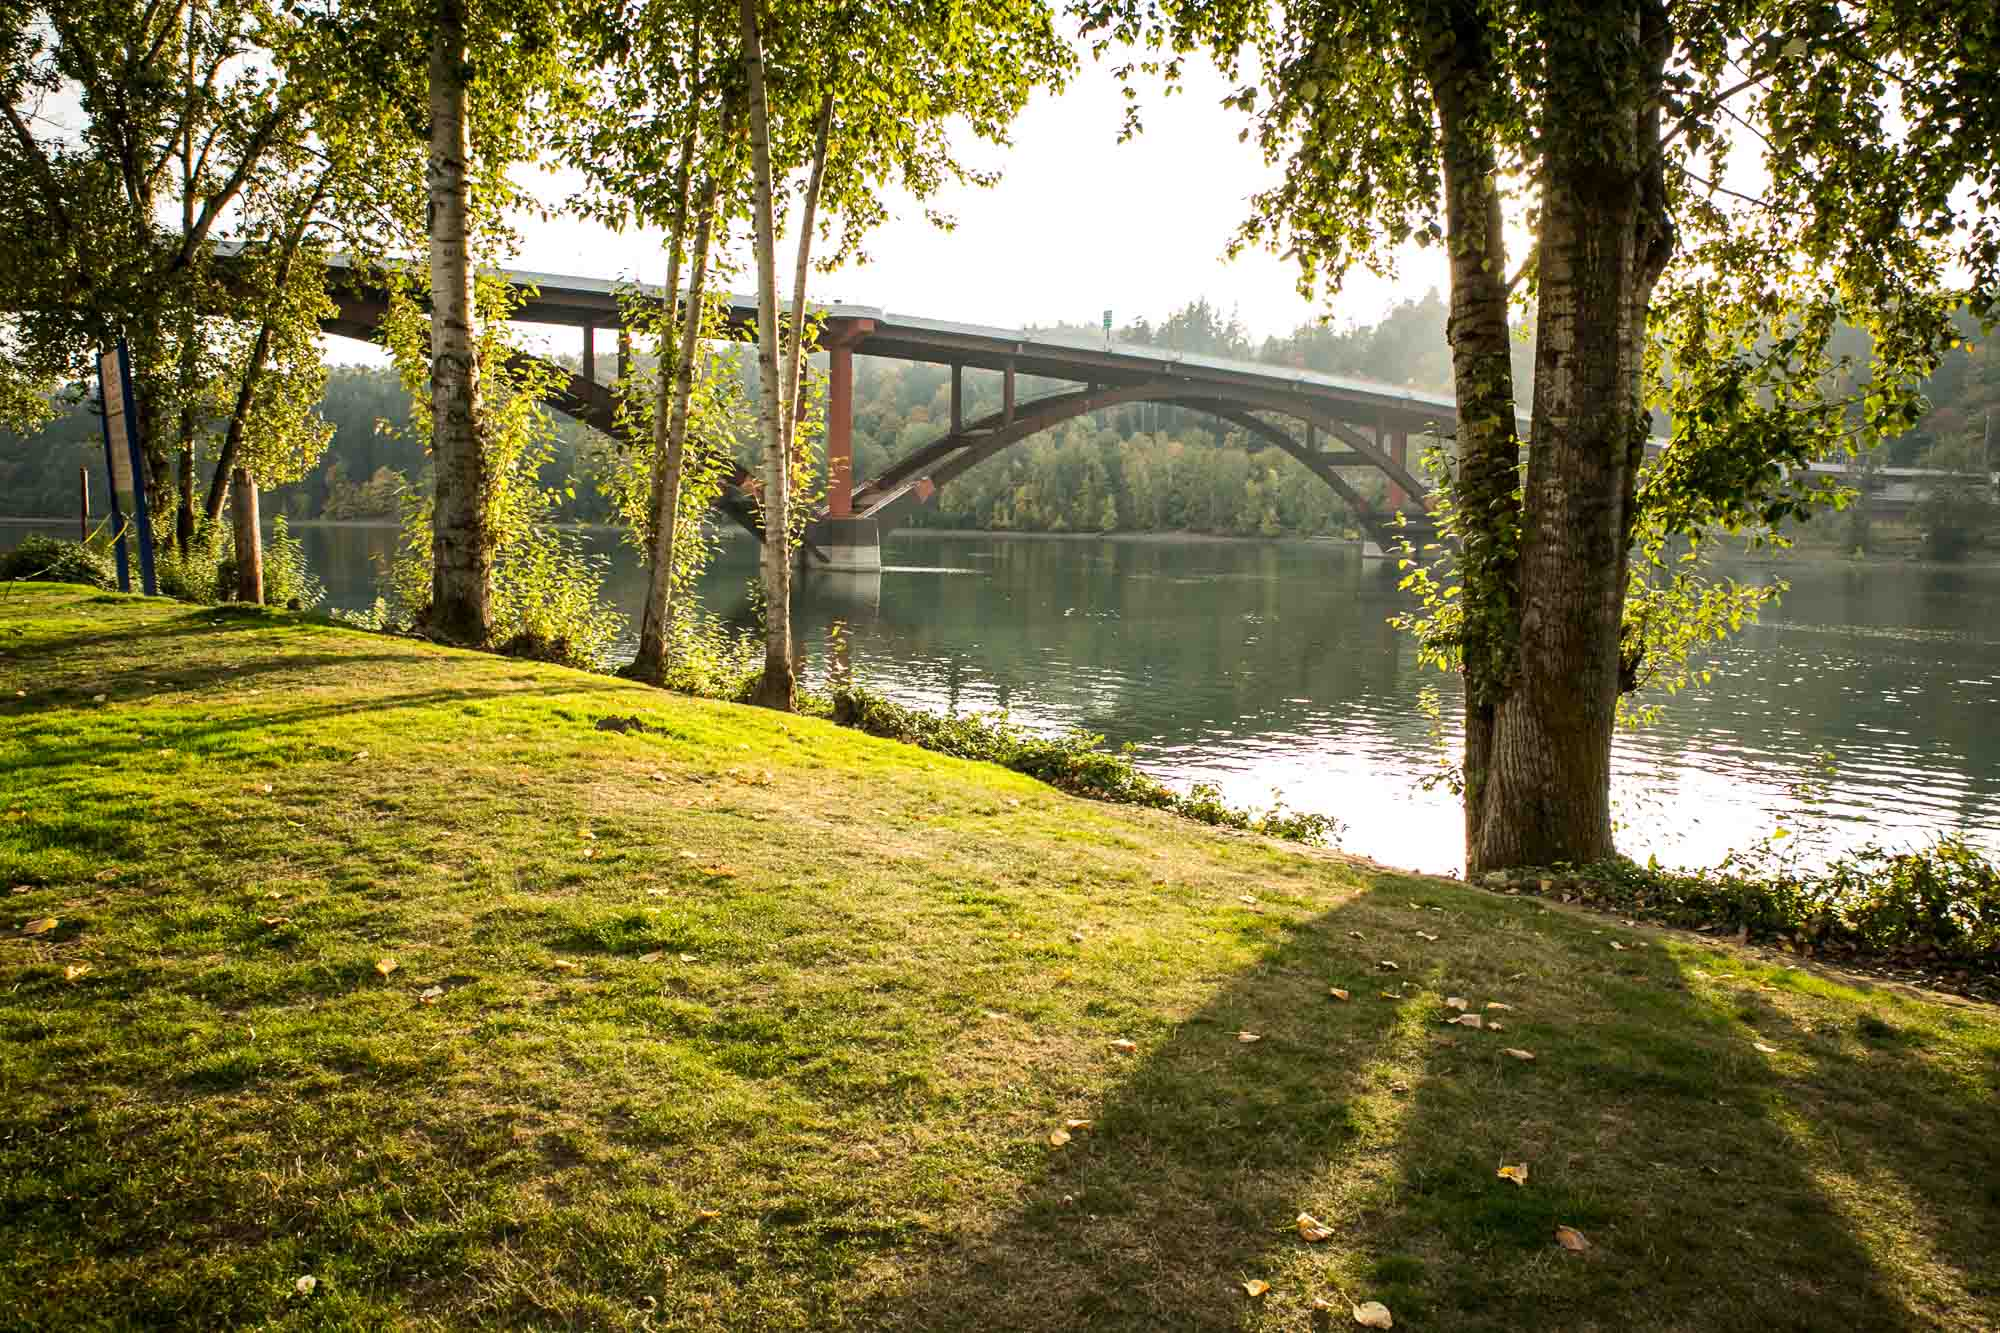 visit-sellwood-moreland-business-alliance_sellwood-riverfront-park-3.jpg